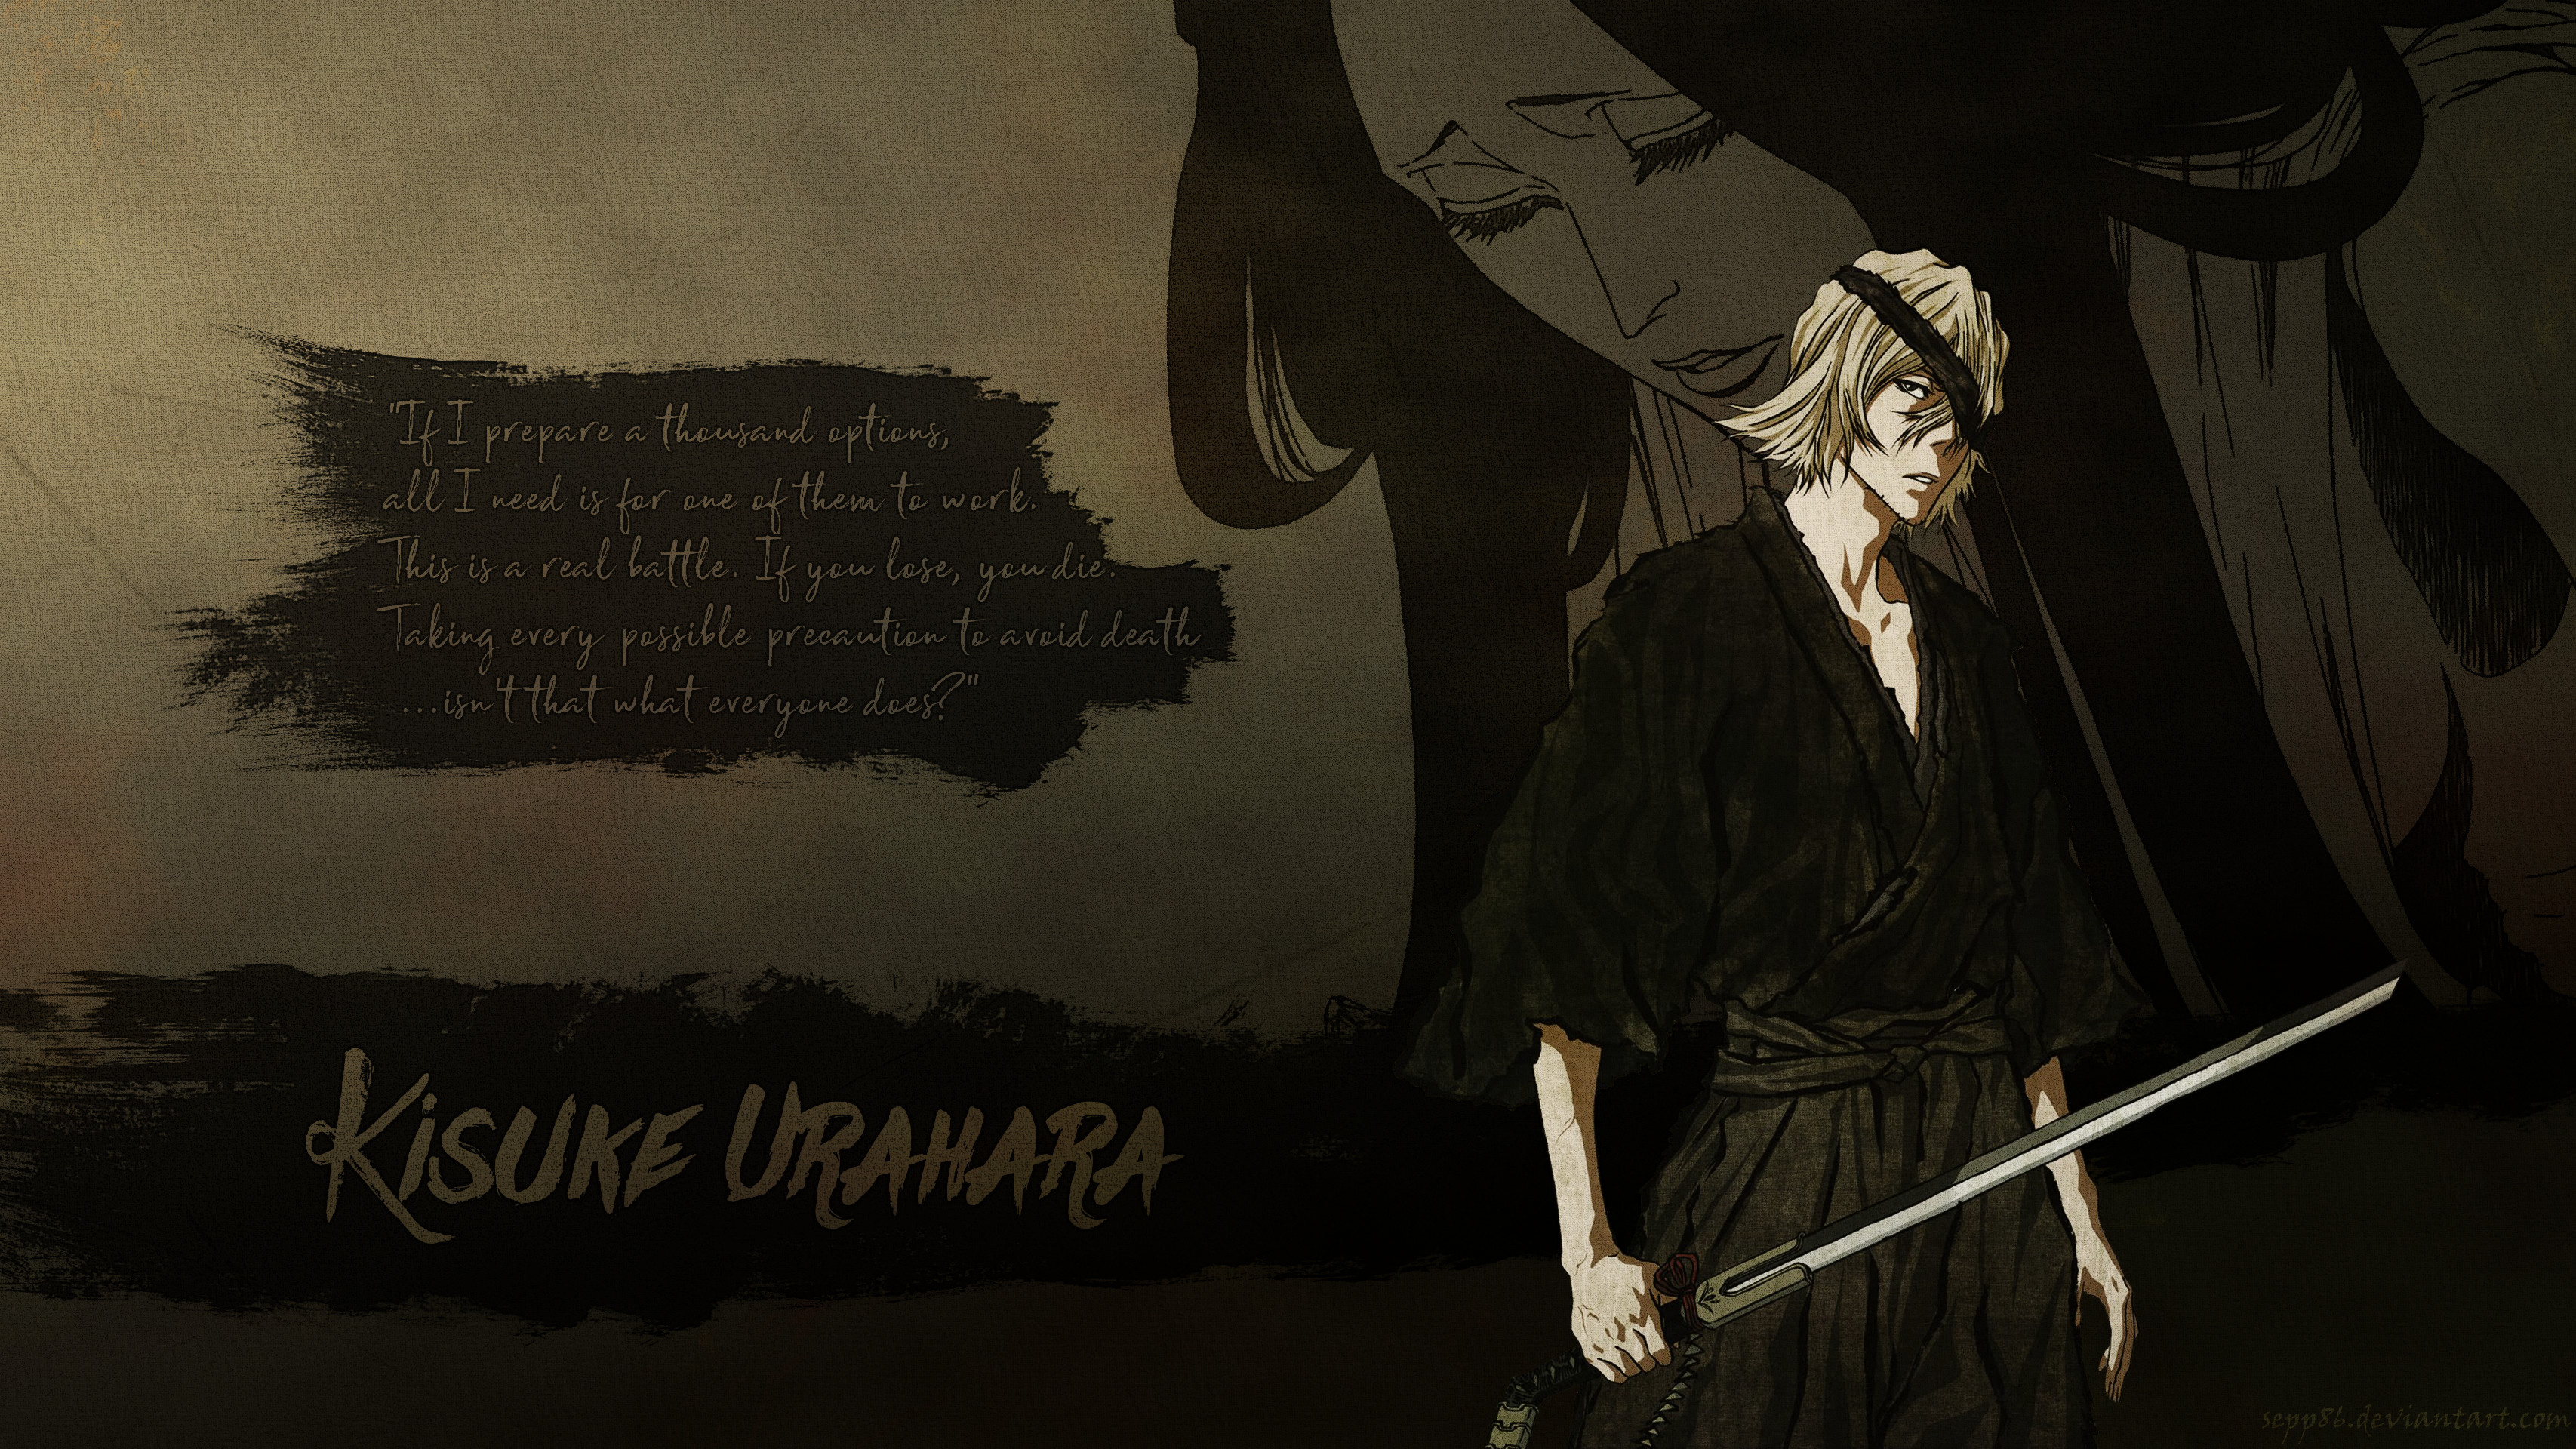 kisuke urahara wallpapers 68 images